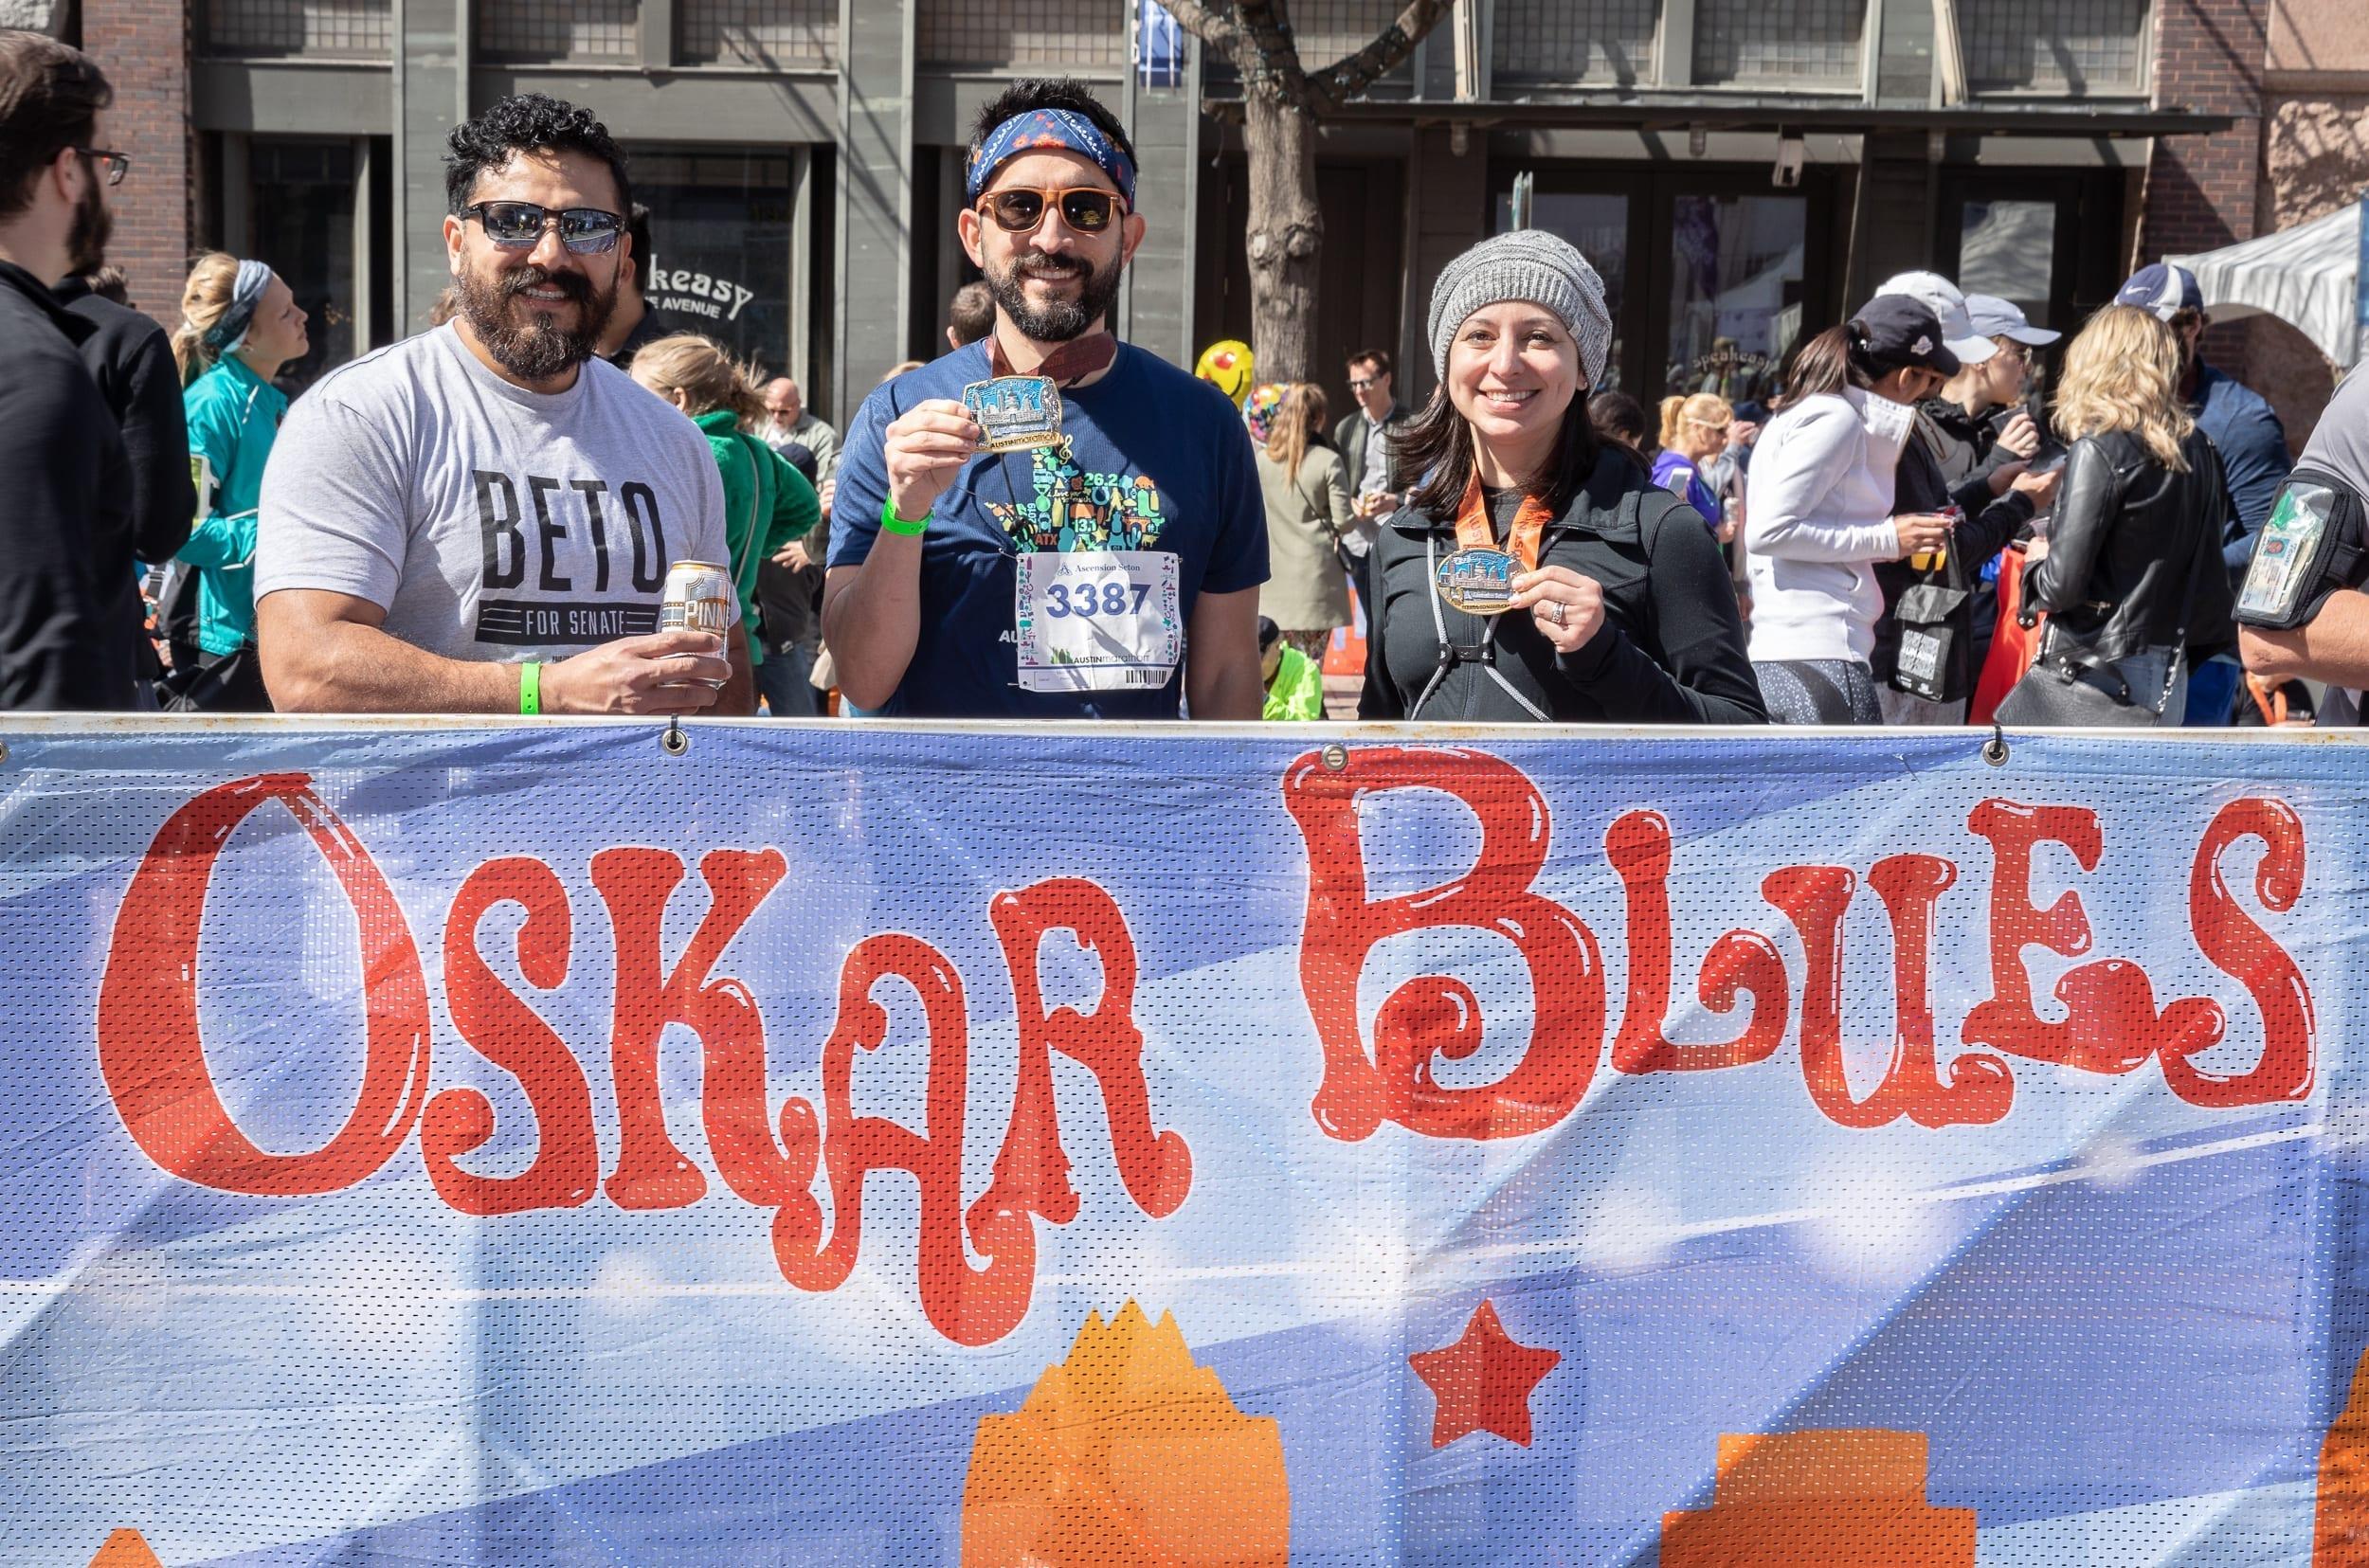 Runners show off their Austin Marathon finisher medals at the Oskar Blues Austin beer garden in the Austin Marathon's 3-block-long finish line festival.